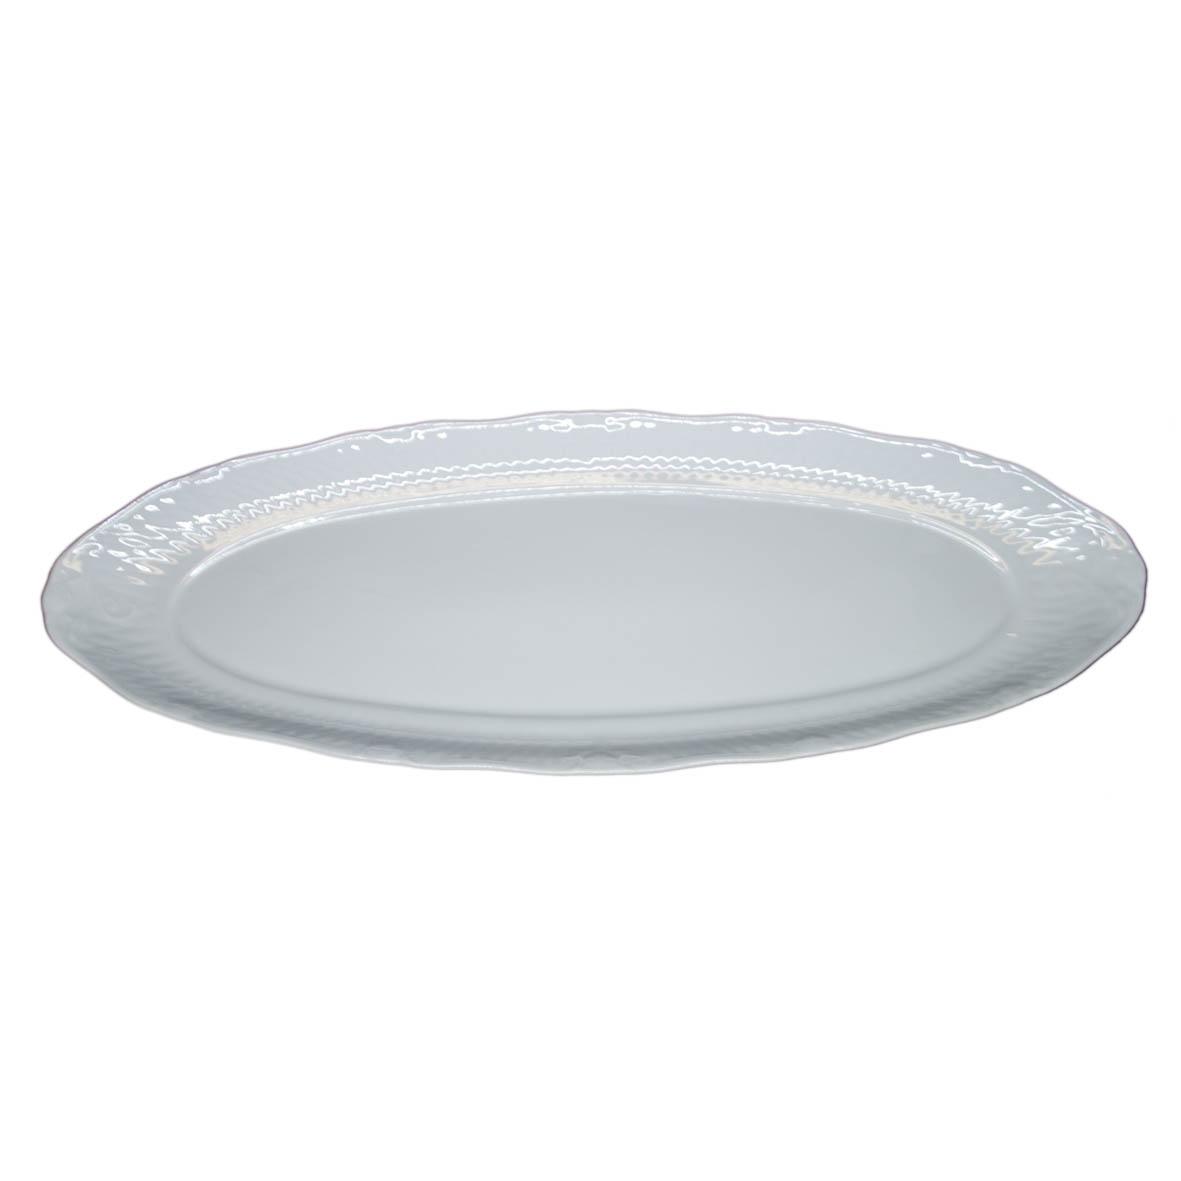 Travessa de Porcelana Oval Peixe 65x24x4